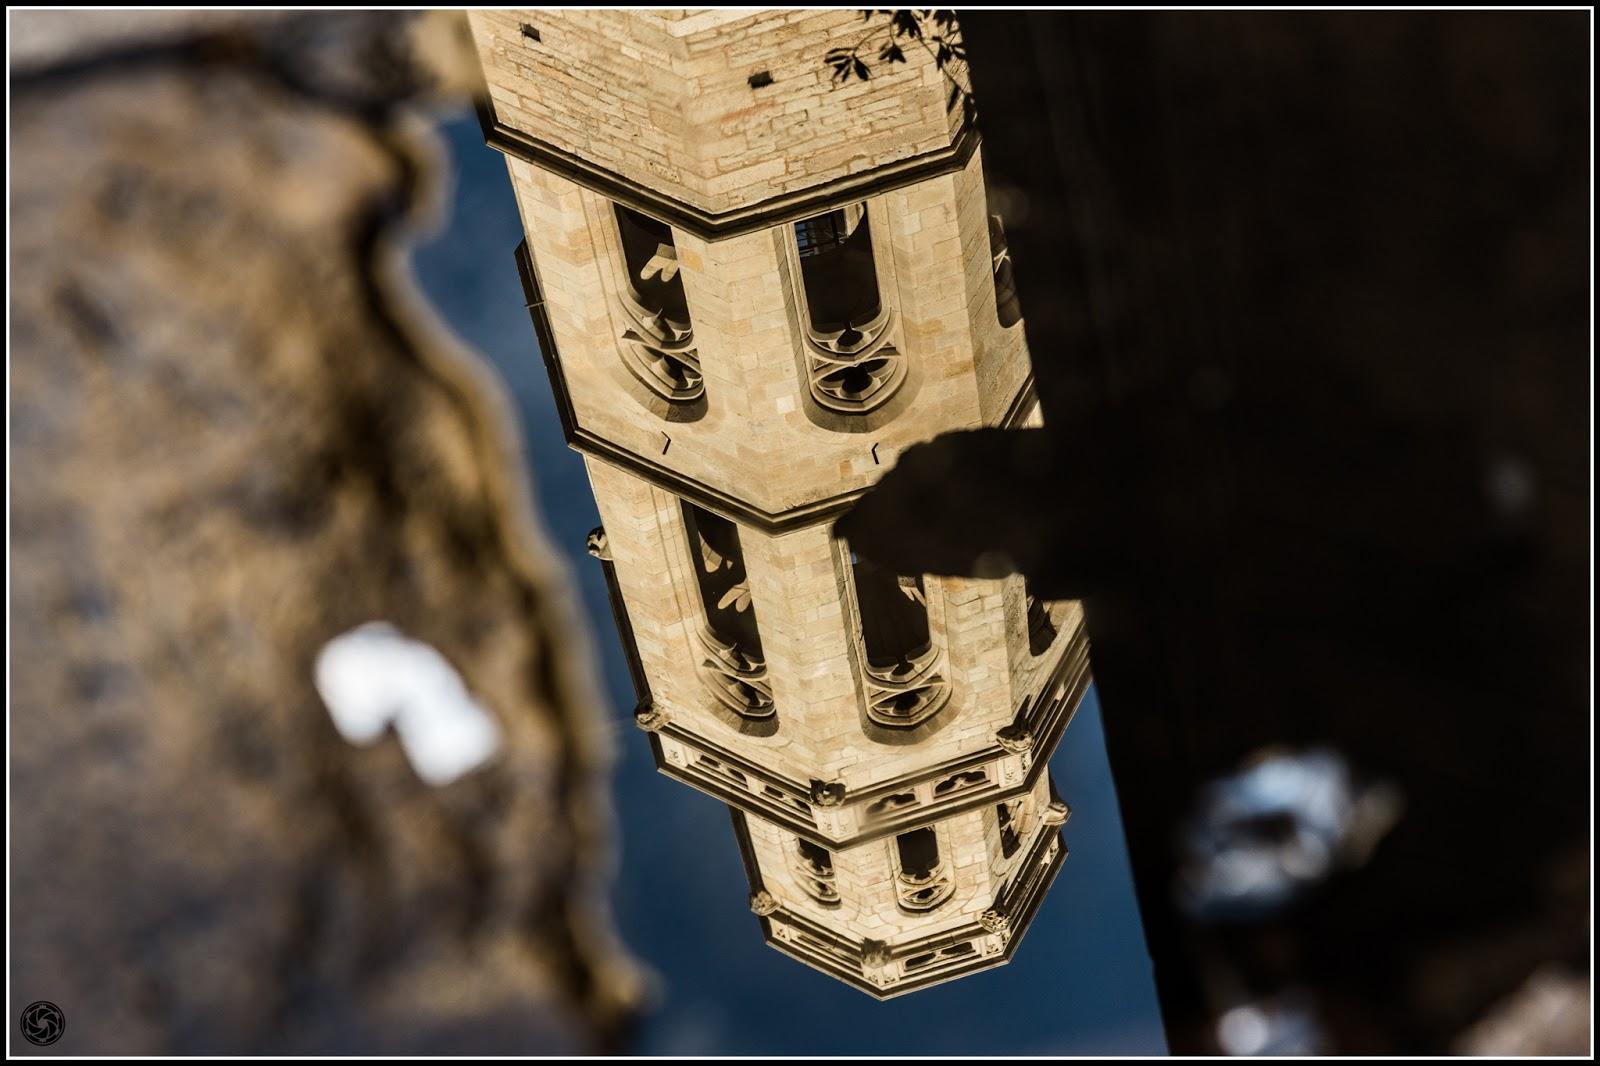 Reflejo de Mar :: Canon EOS5D MkIII | ISO800 | Canon 24-105@105mm | f/7.1 | 1/50s